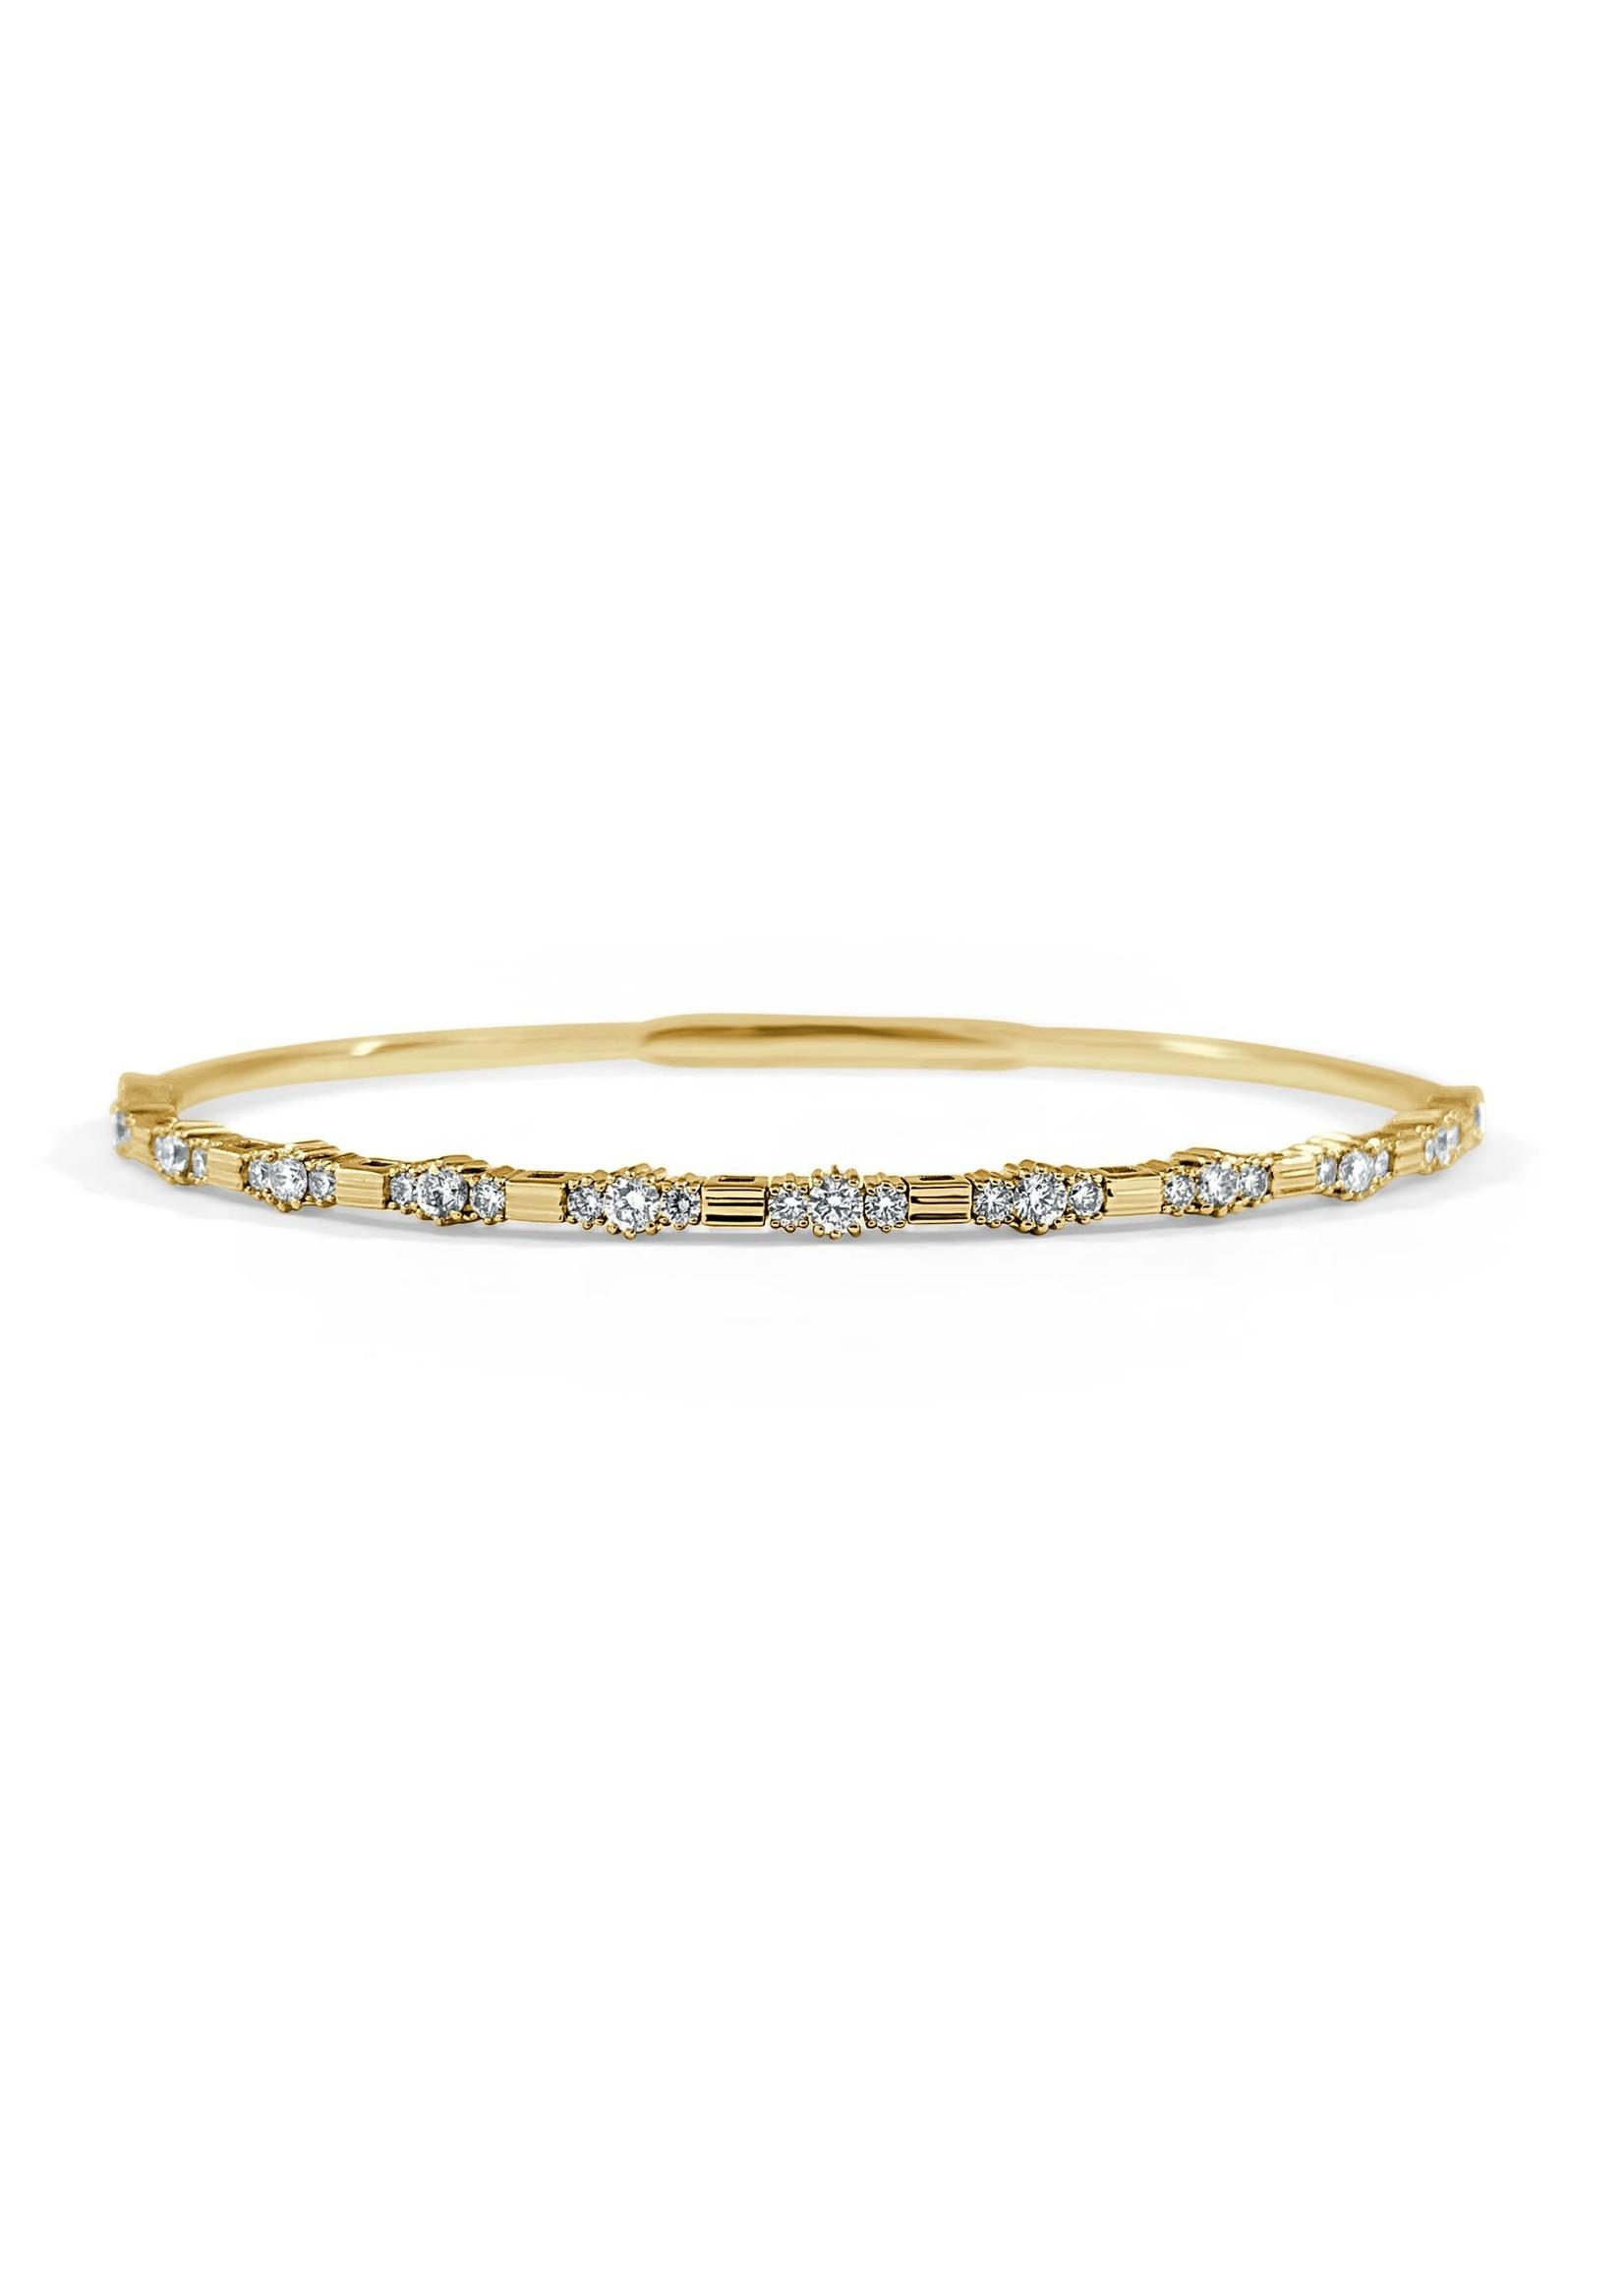 Jill Alberts Diamond Flexible Bangle